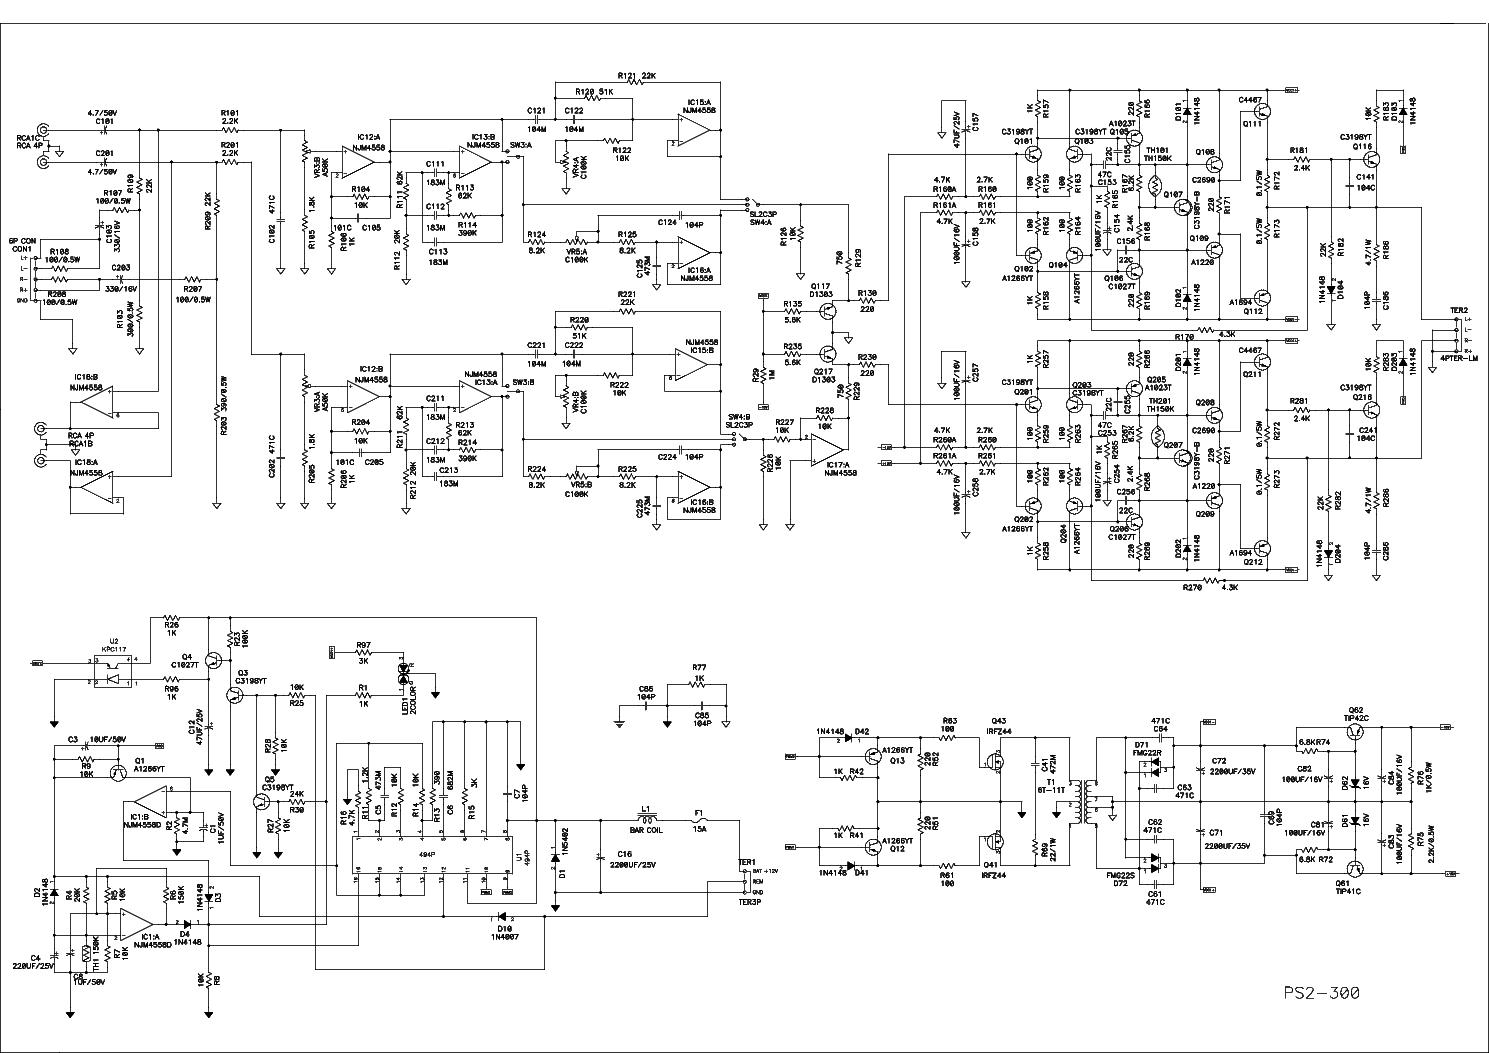 power acoustik ps2 300 ps4 600 ps2 1600 ps2 1200 ps2 820 ps2 520 ps2 rh elektrotanya com ps2 slim power supply schematic